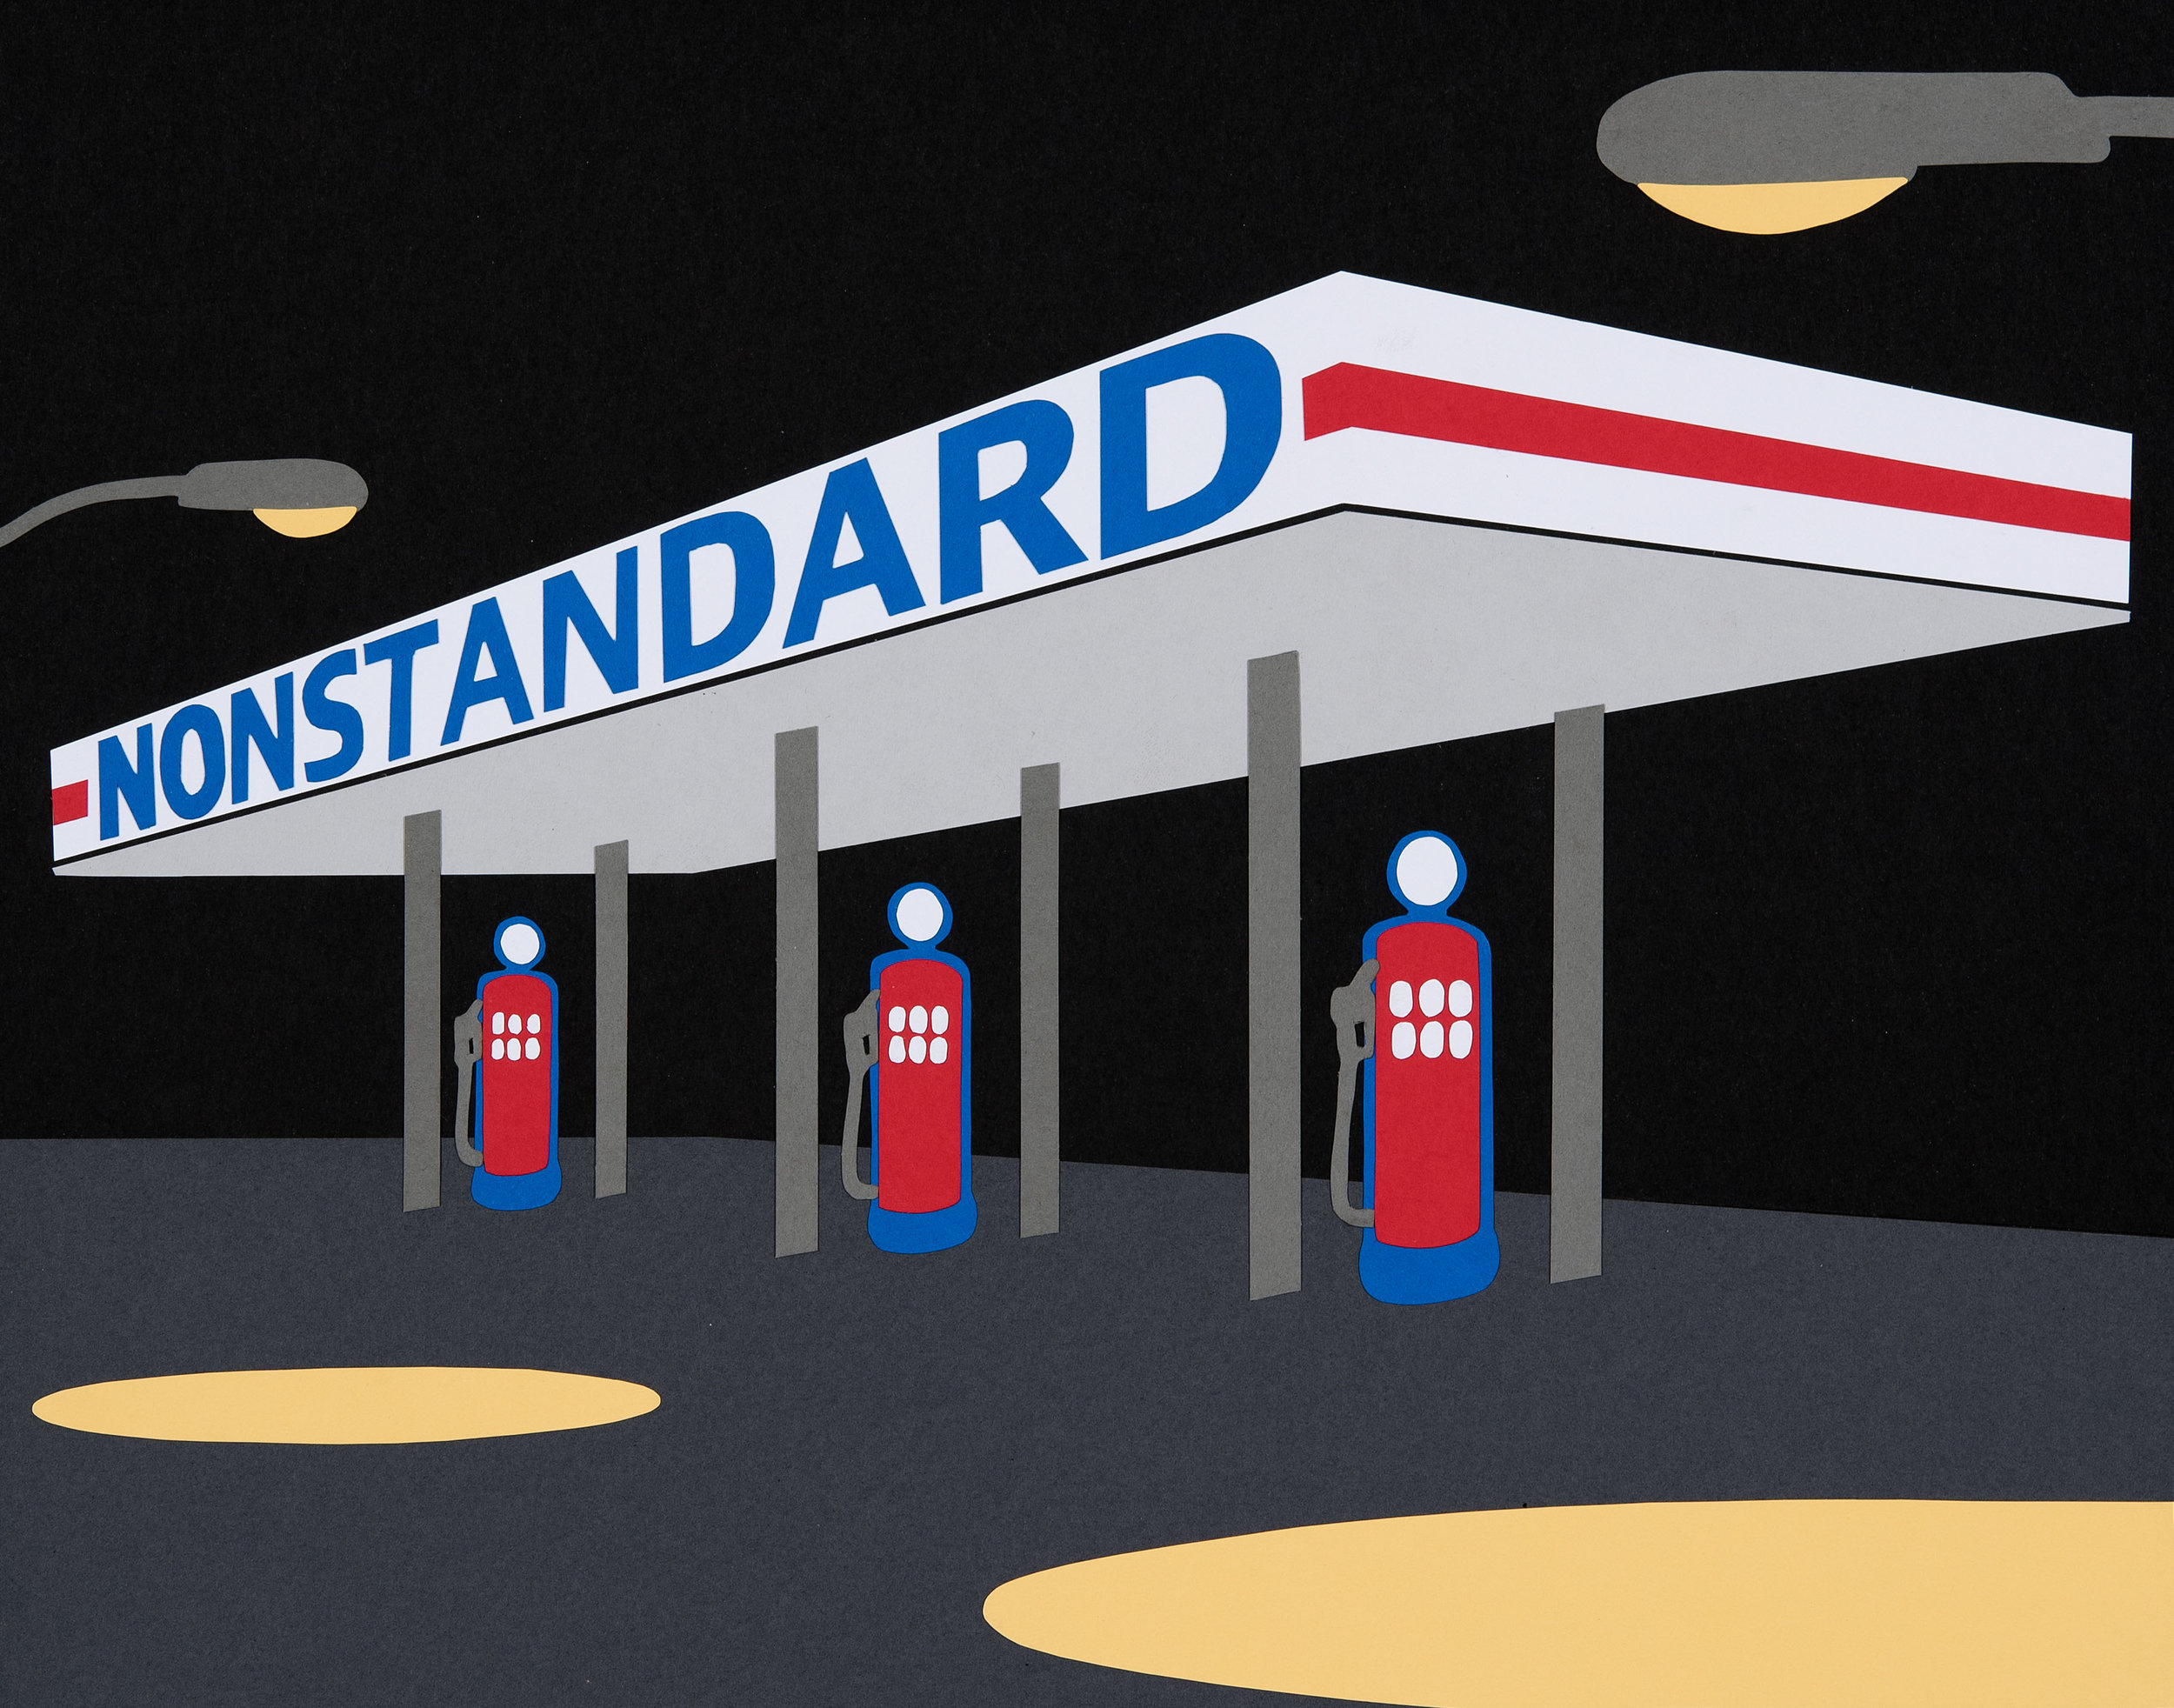 Nonstandard